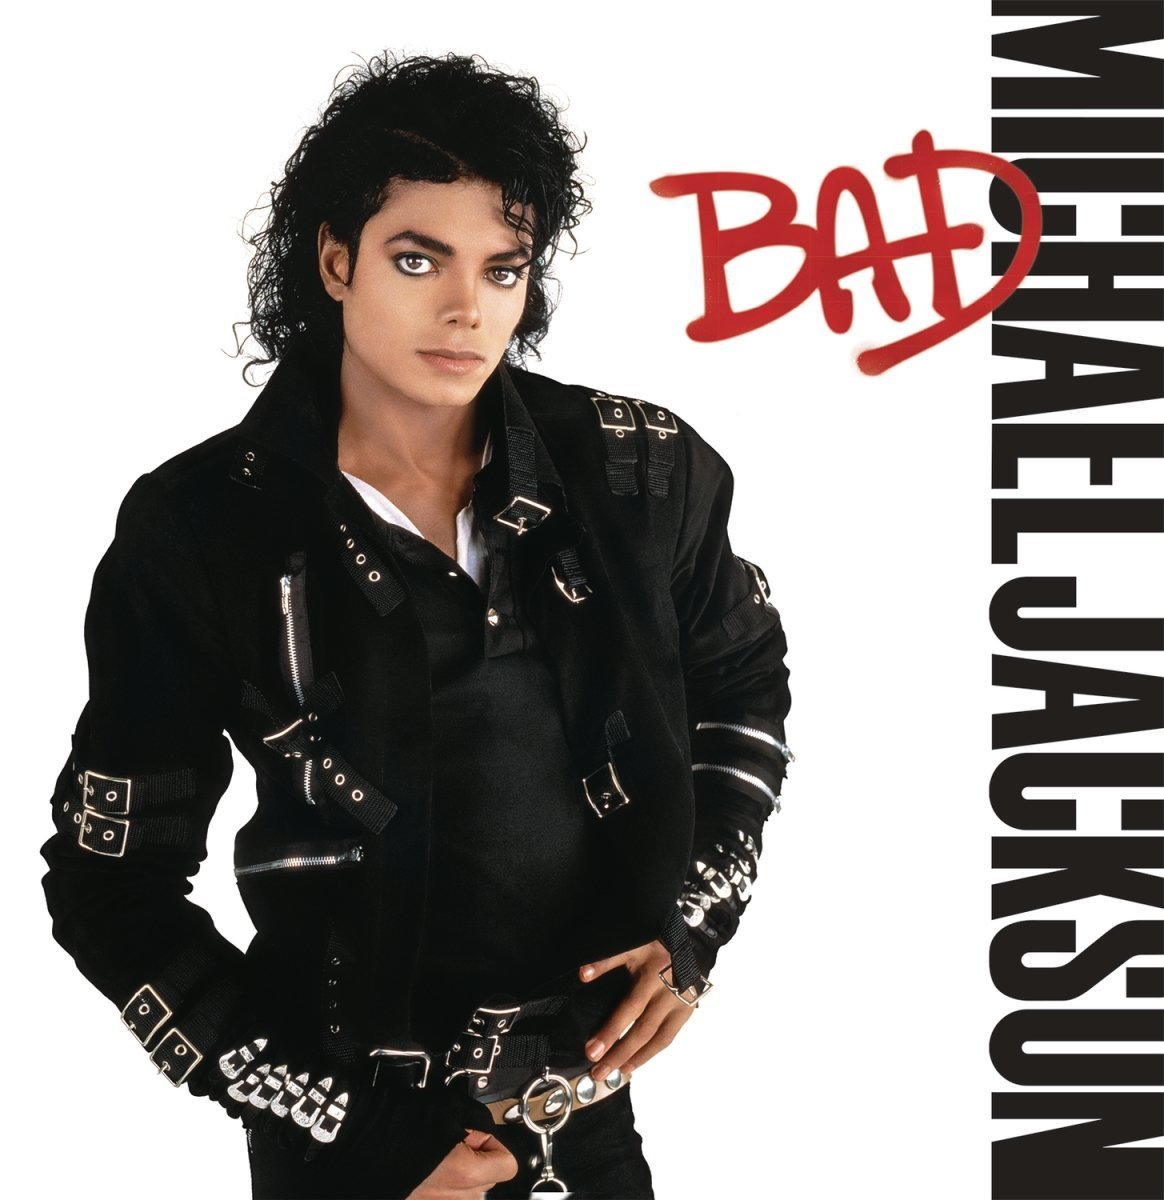 Na Vitrola: 30 anos de Bad, de Michael Jackson